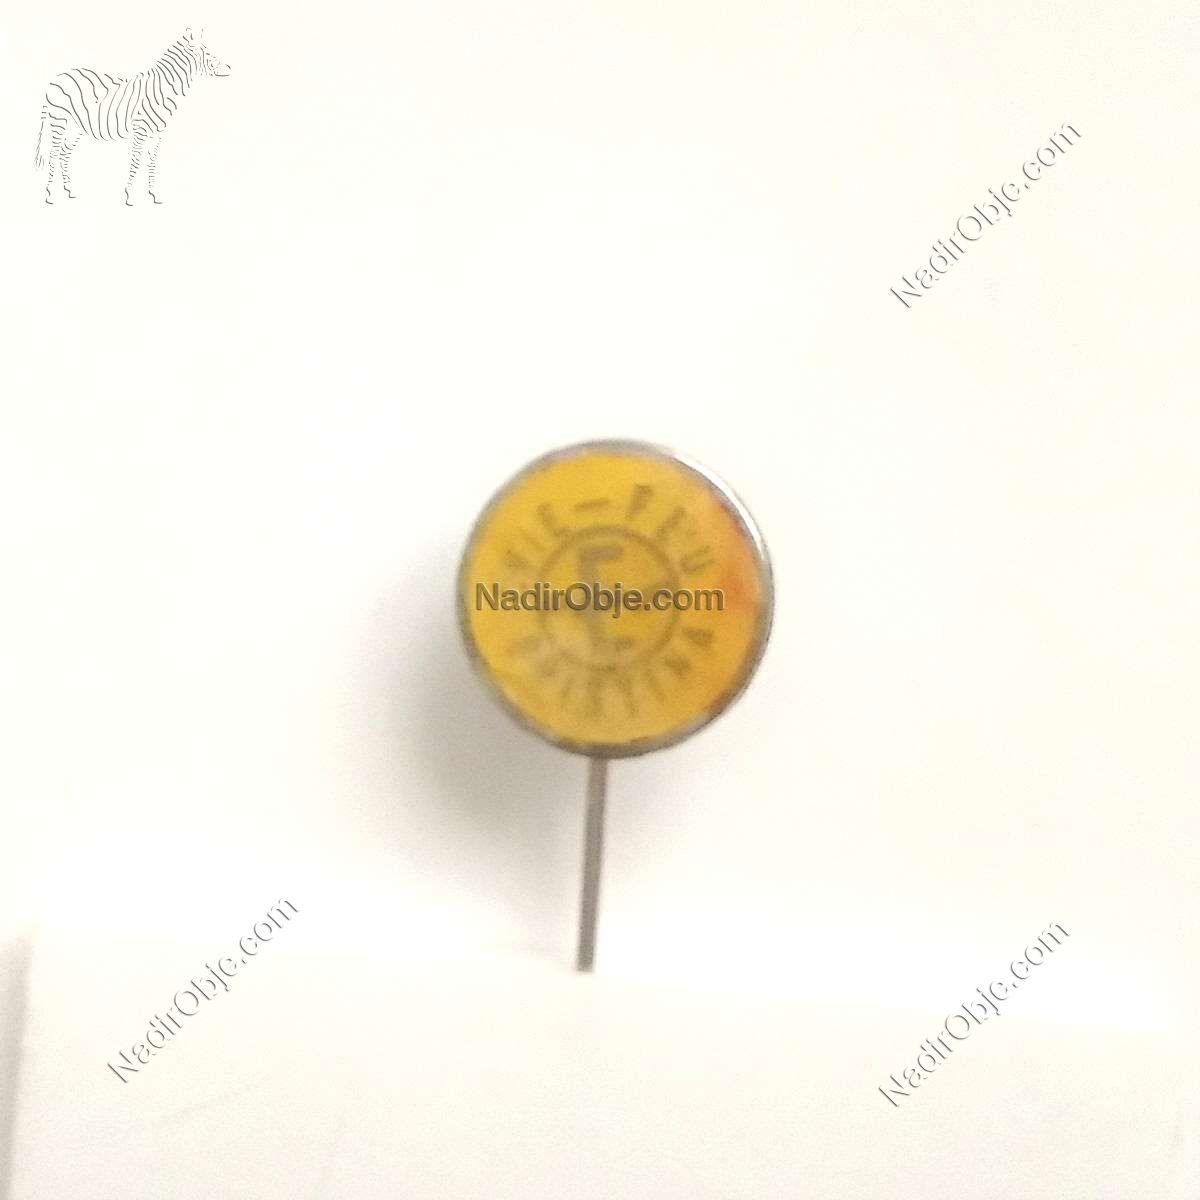 Fvie Feu – Pristina Rozet – N2067 Metal Objeler Lapel Badge